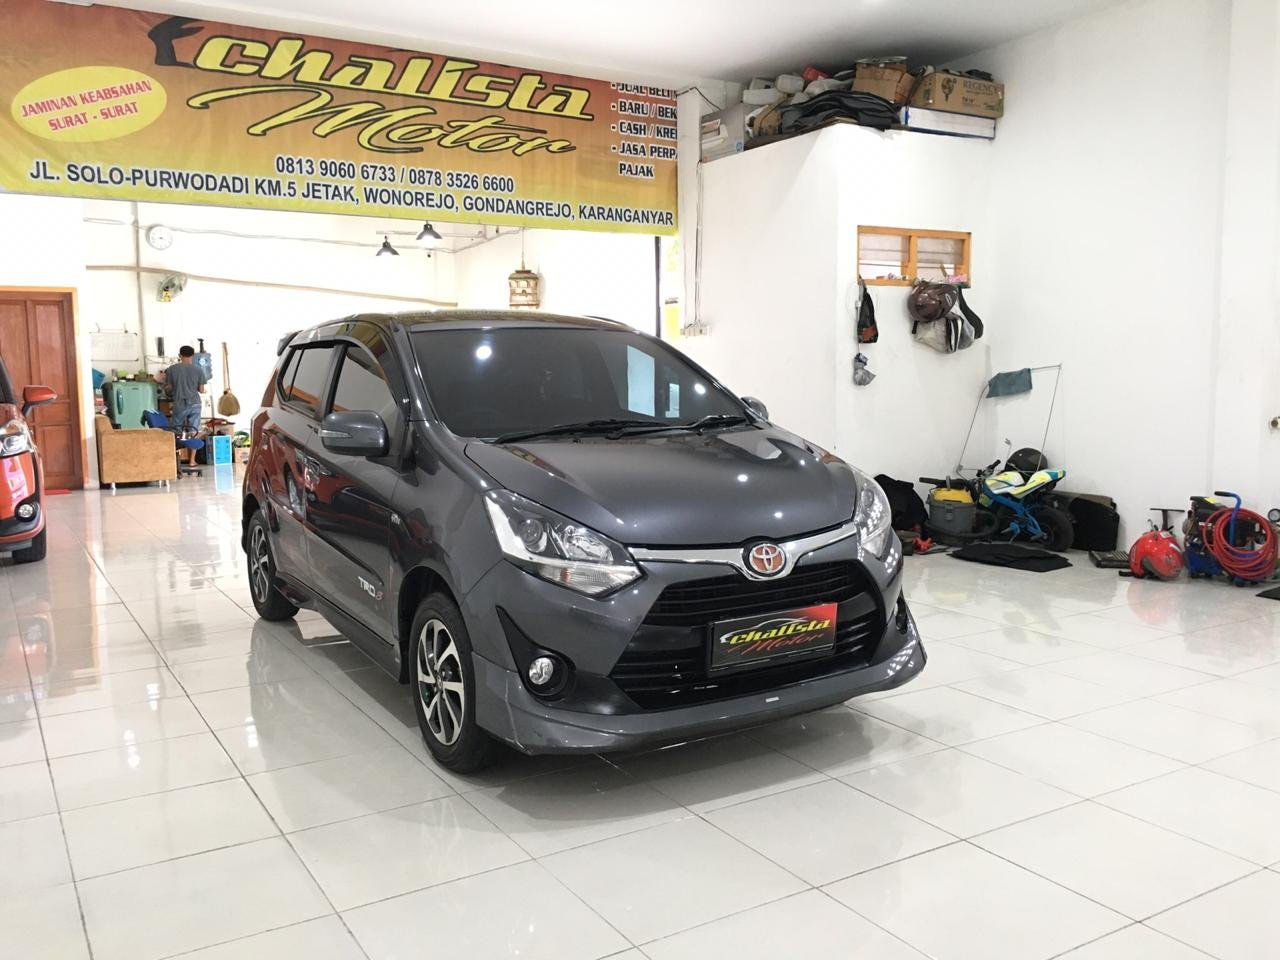 2018 Toyota Agya Trd Sportivo - Mobil Pilihan (preview-0)